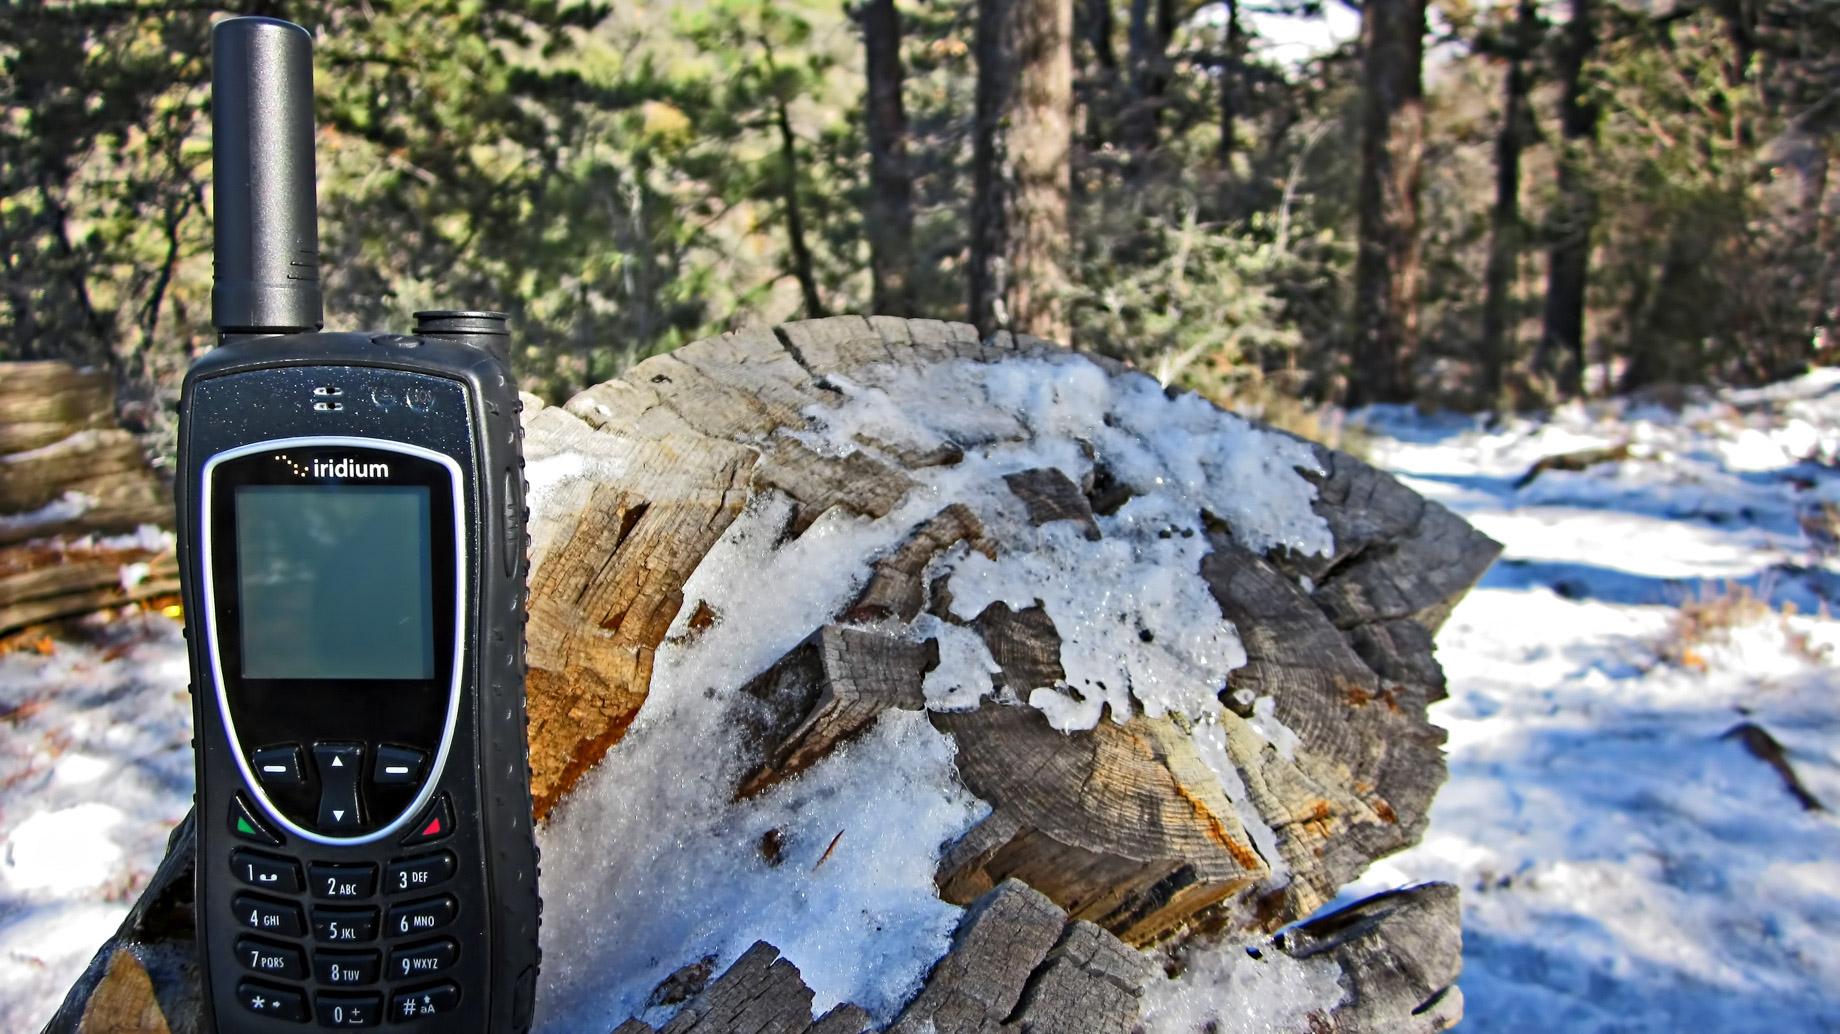 Global Wanderlust - High Tech Travel Gadgets for the World Explorer - Satellite Phone